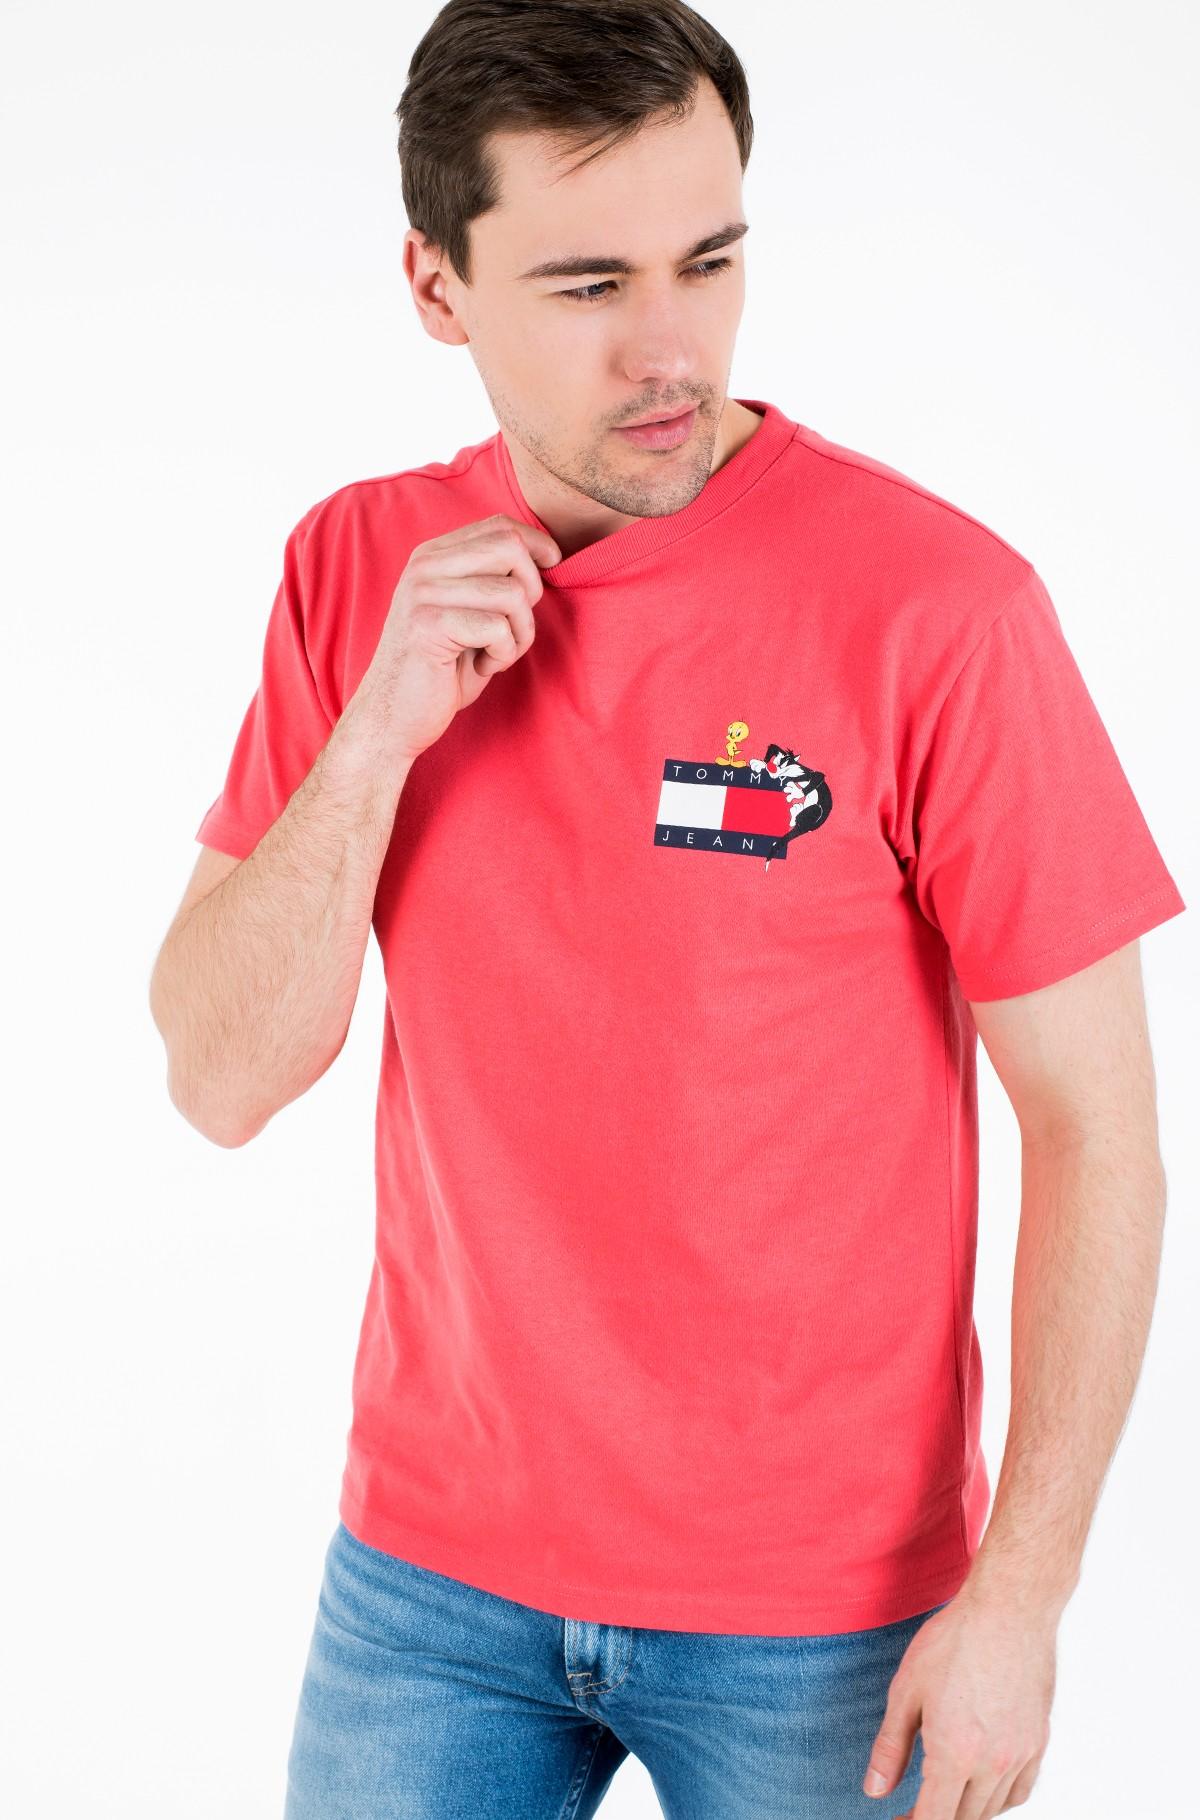 T-shirt TJM LOONEY TUNES TEE M1-full-1